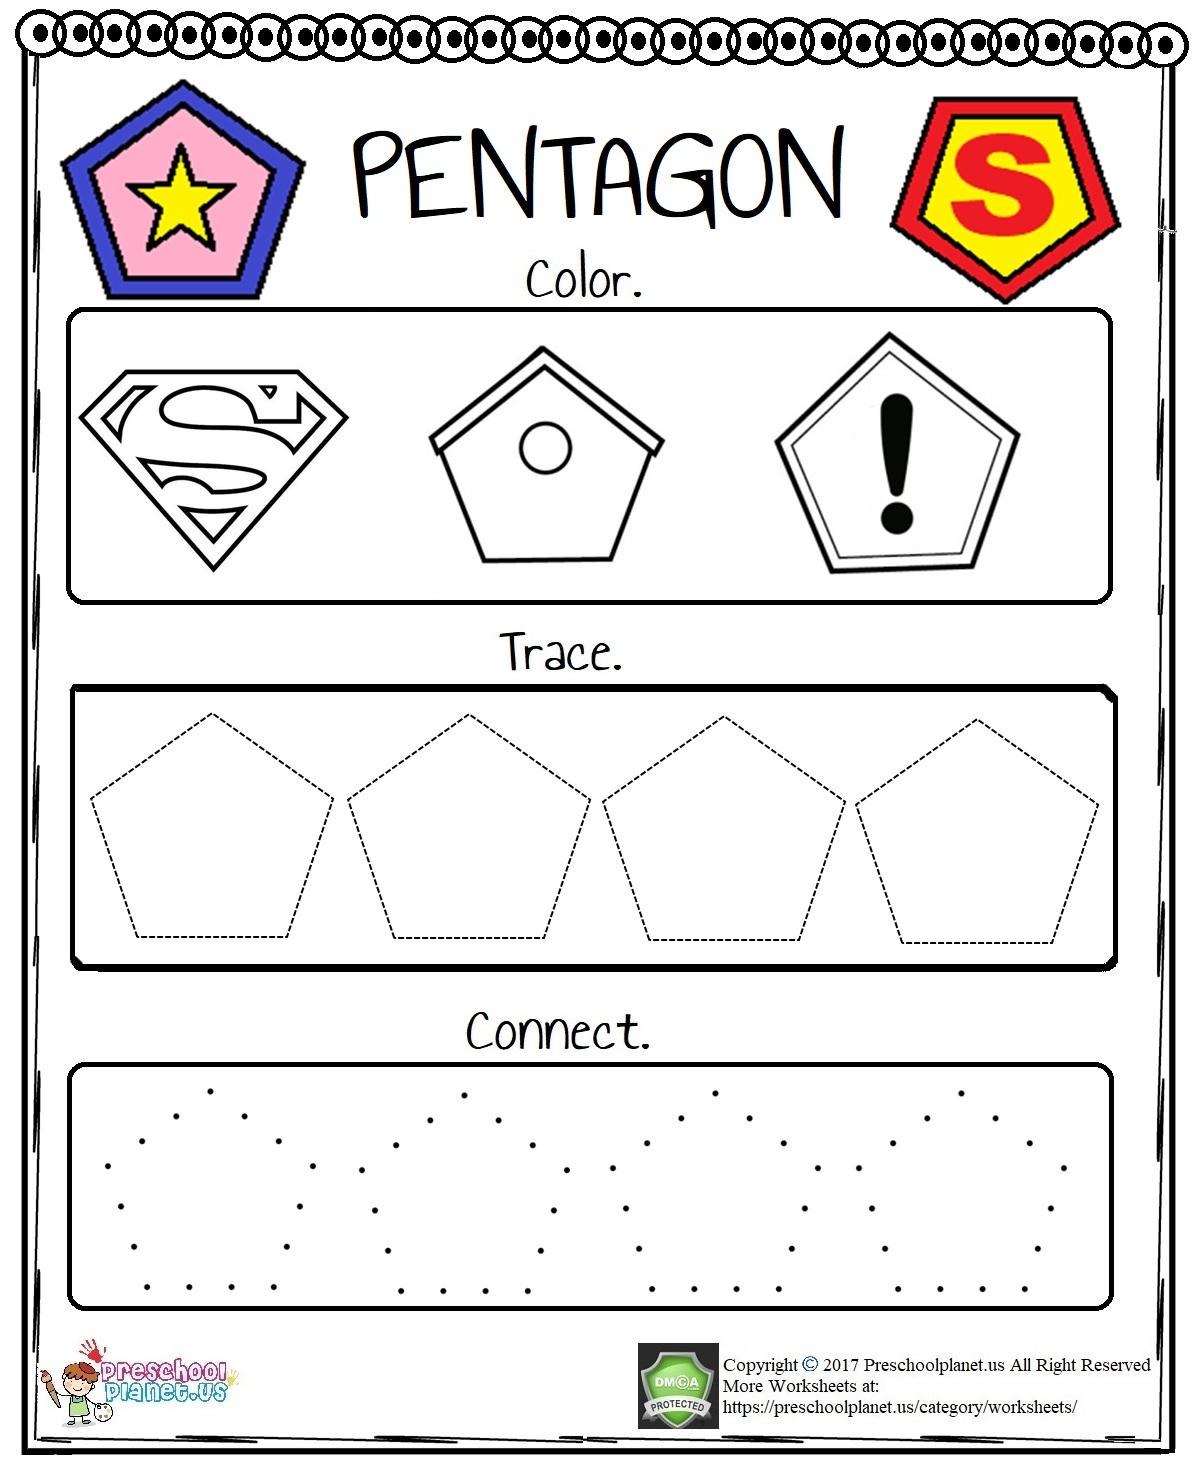 Missing Number Worksheets For Preschool Preschoolplanet